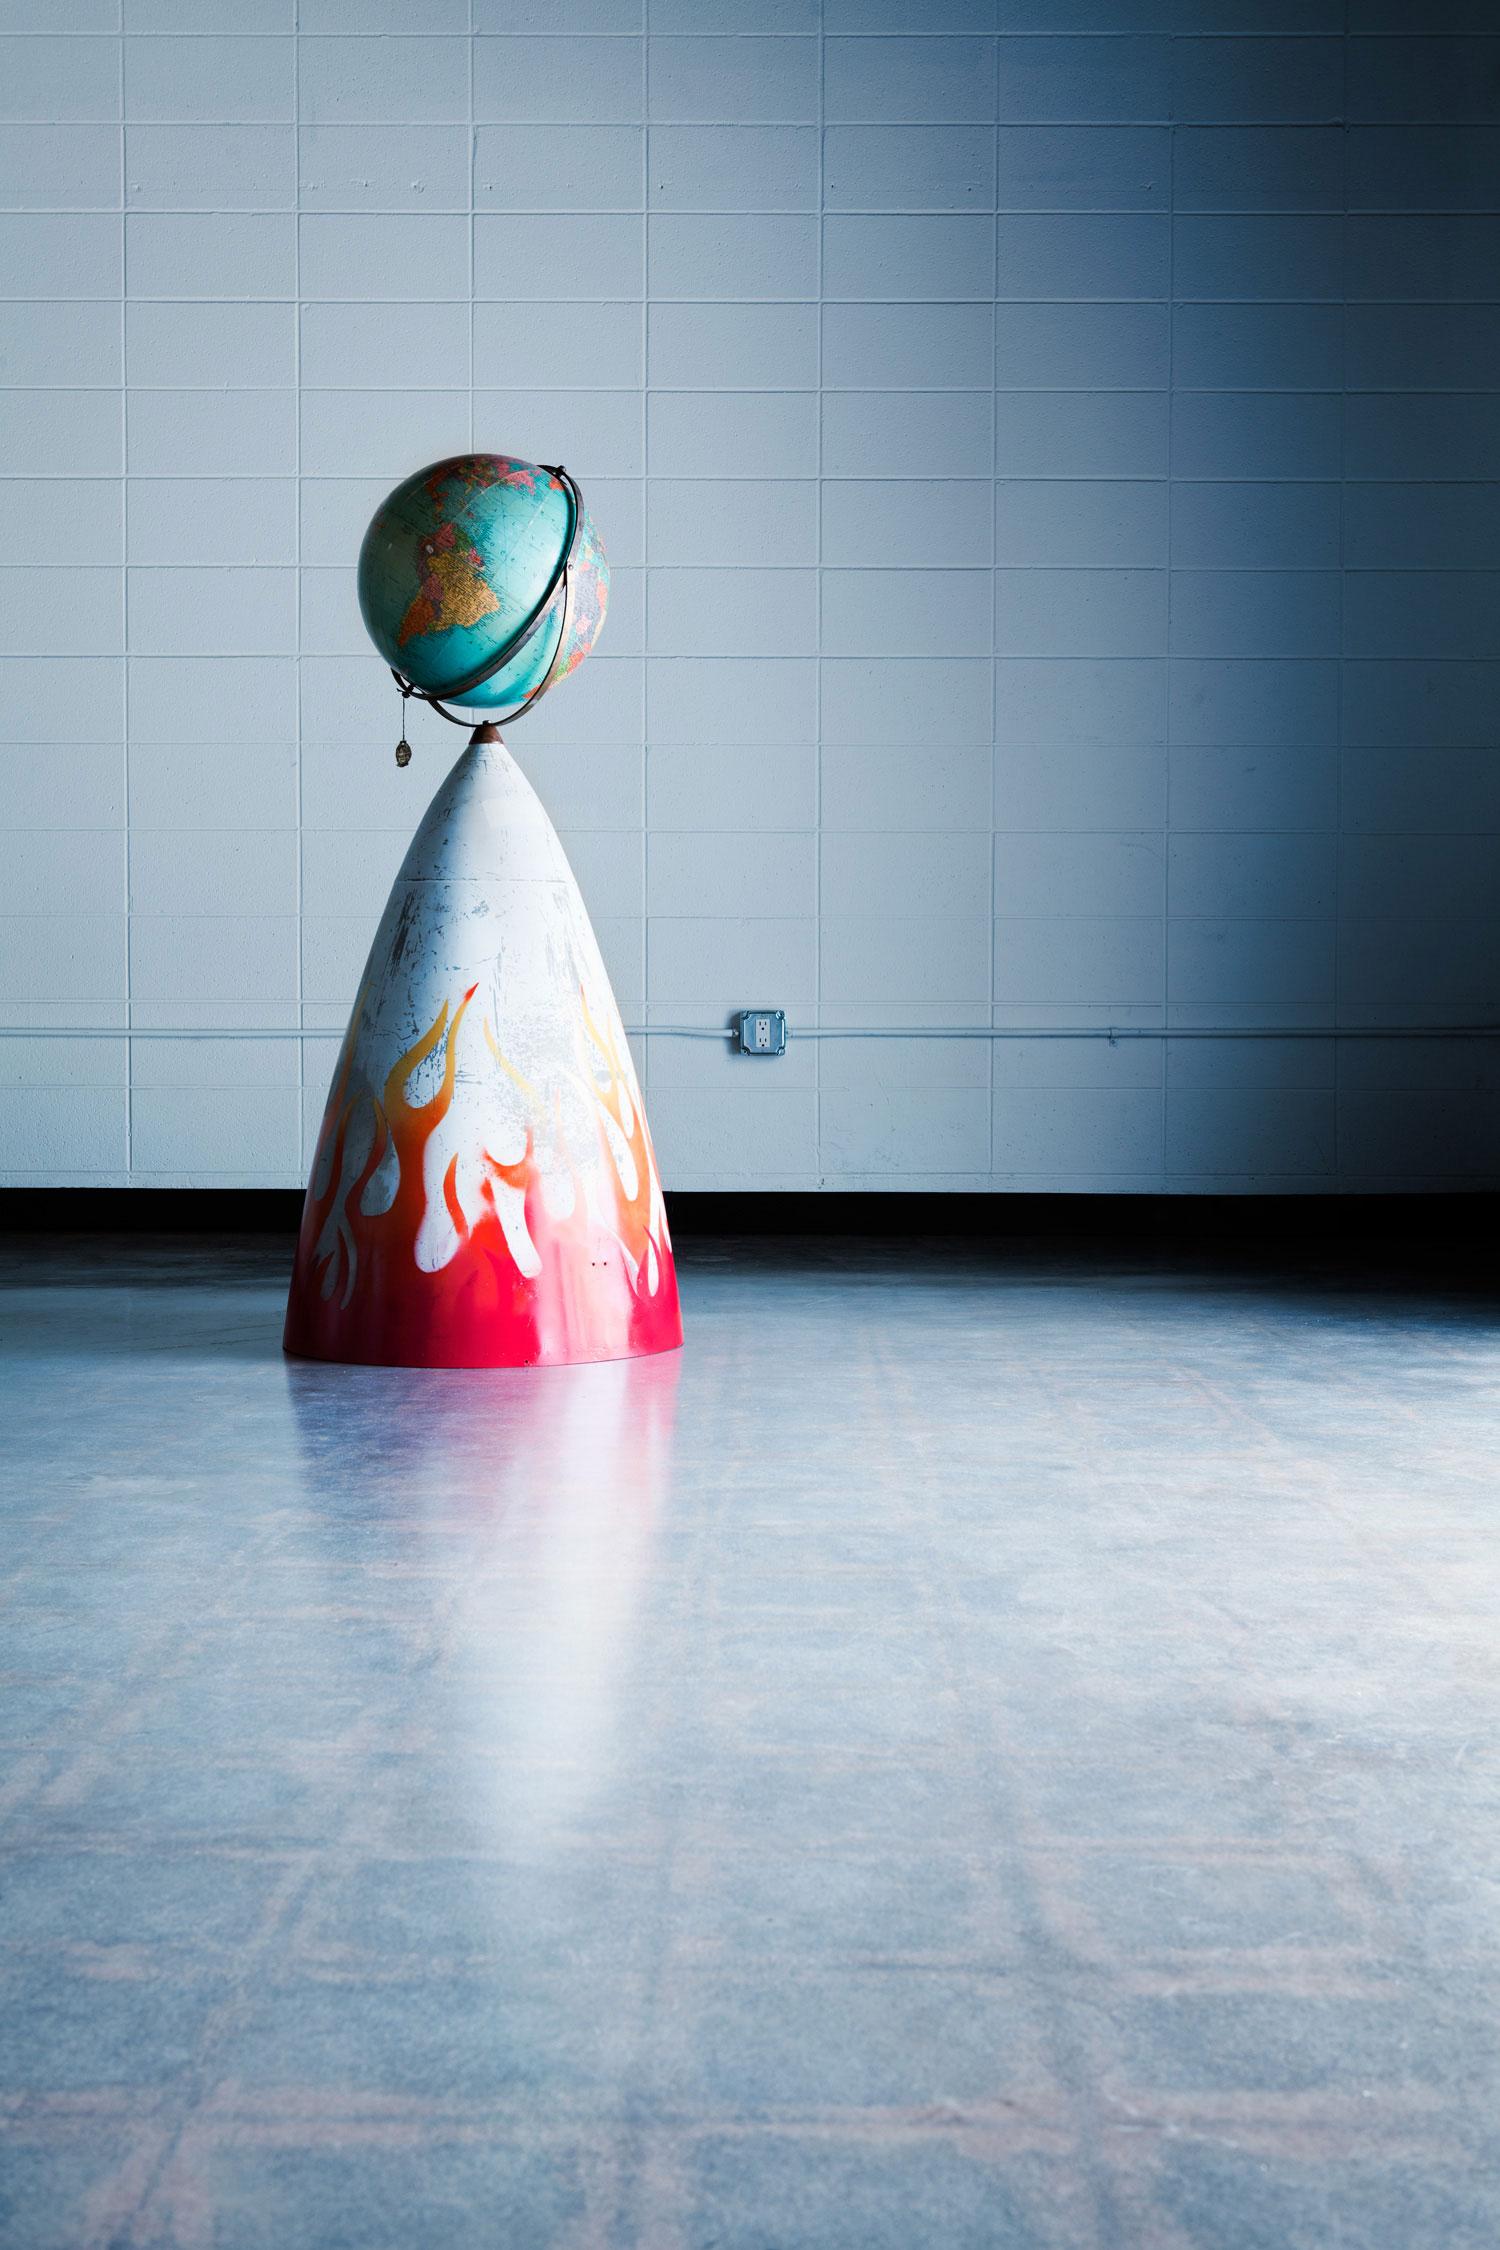 ron-miriello-grafico-san-diego-100-worlds-project-sculpture-globe-Miriello-branding-officina-04jpg